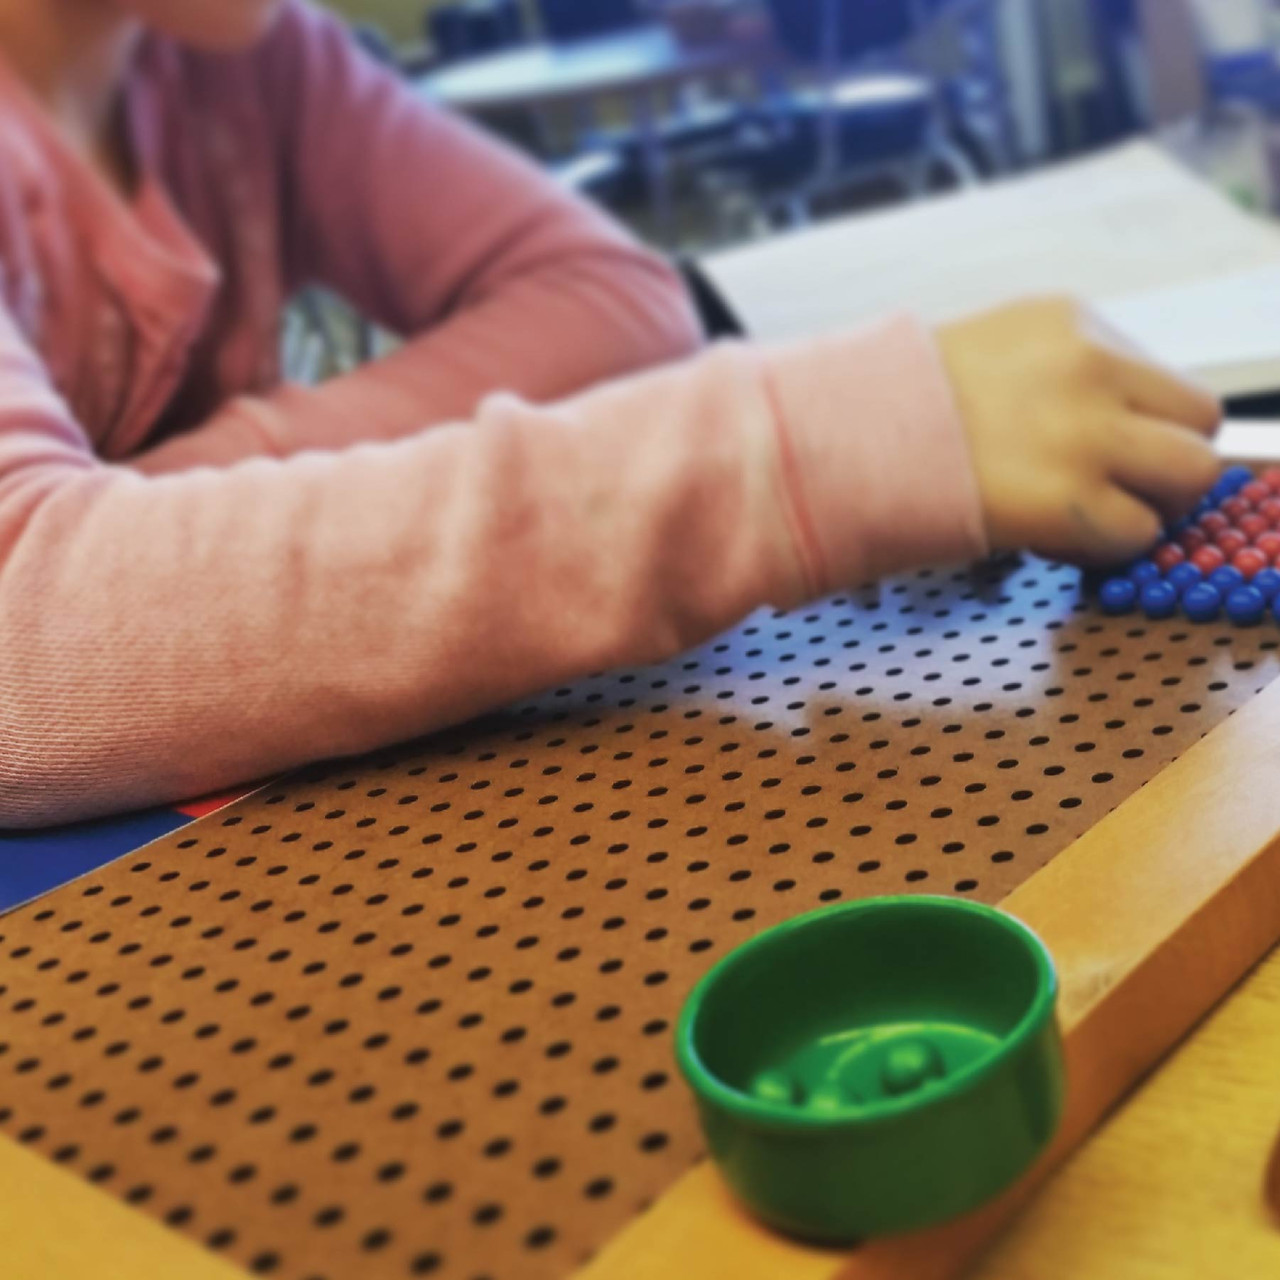 Multiplication & Mystery BUNDLE II: 6s 7s 8s 9s - SEMI-PRO Elementary Montessori Math help